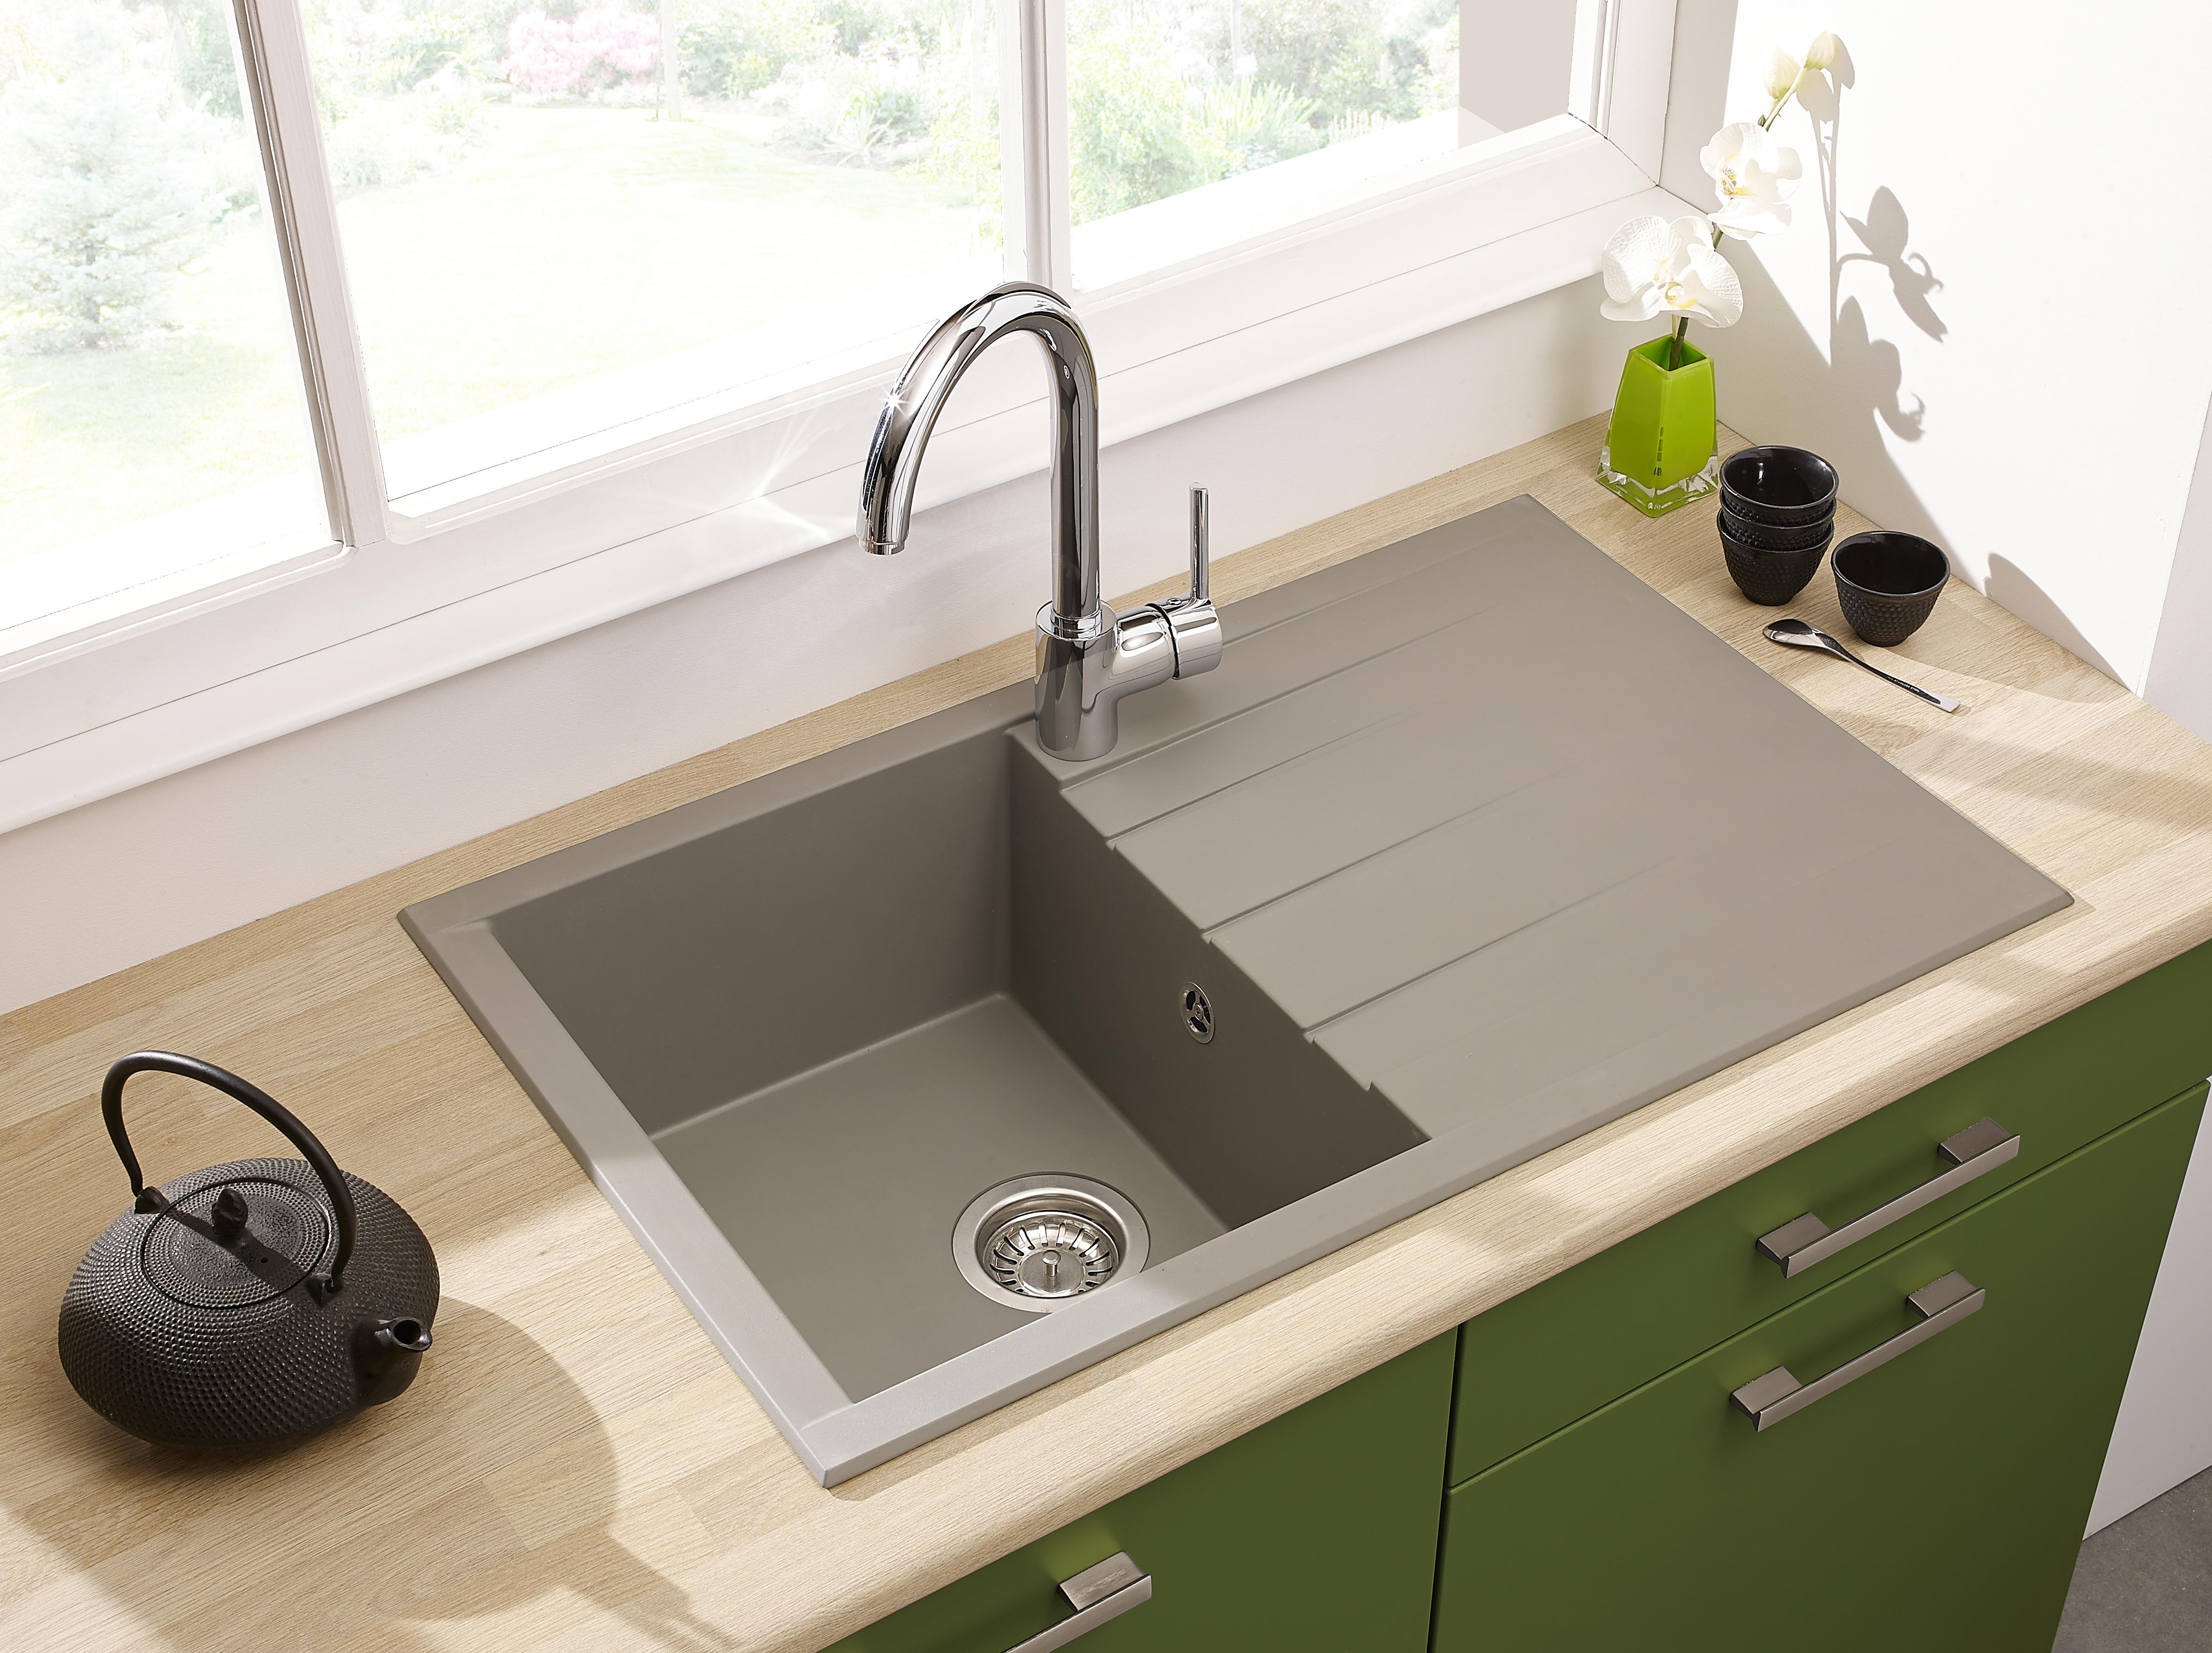 Spüle Küchenspüle Einbauspüle Granit Spülbecken Mineralite 80 x 50 grau respekta